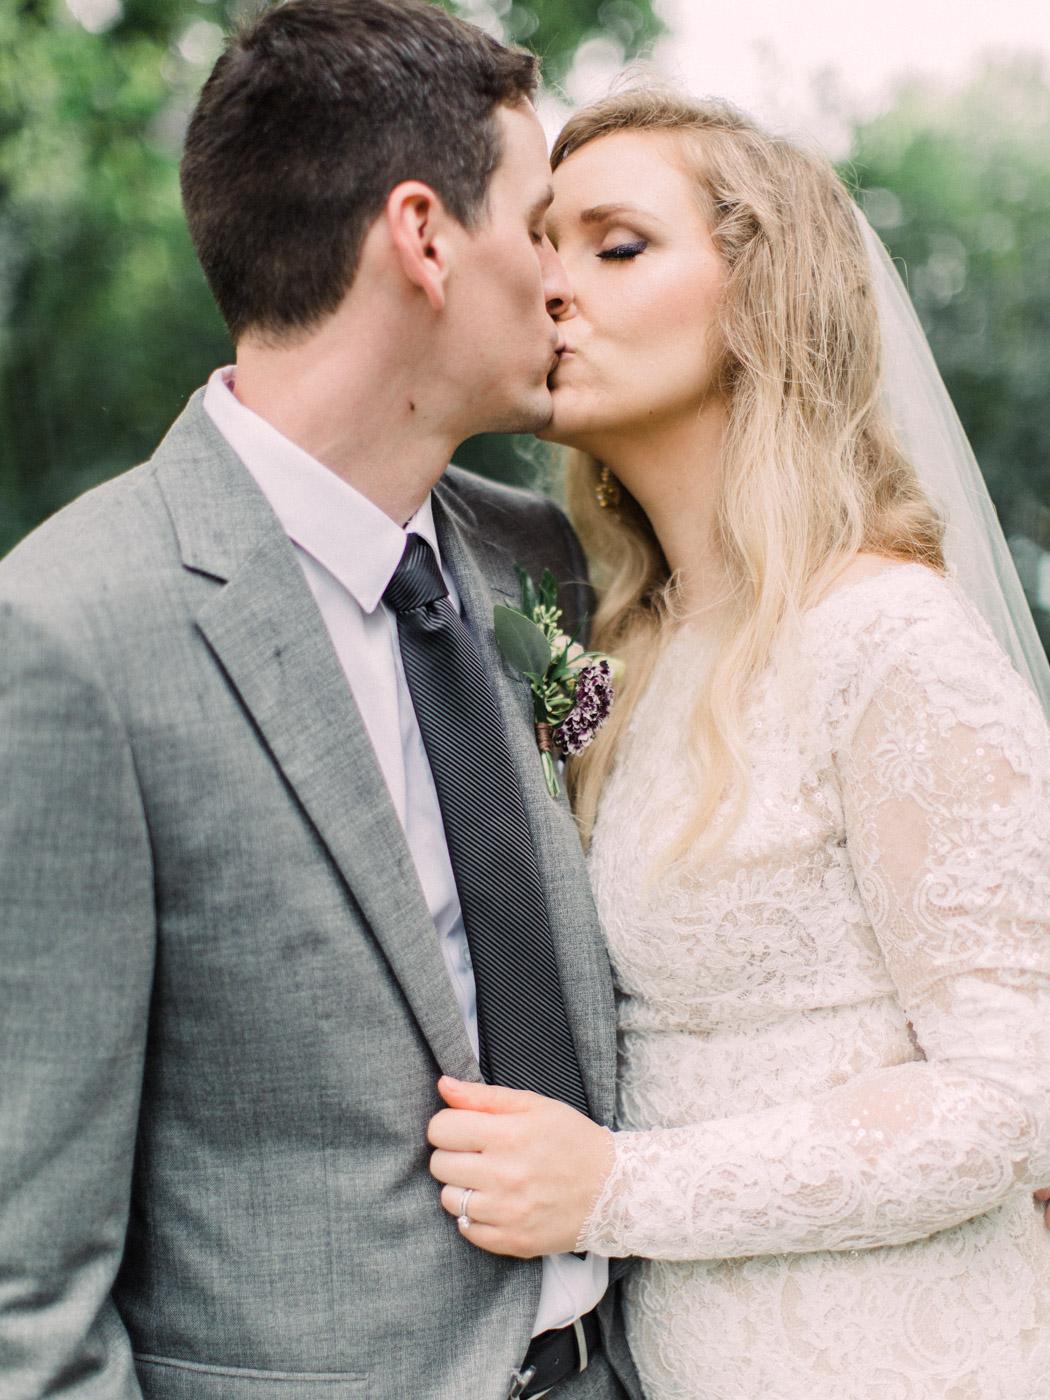 Toronto-wedding-photographer-intimate-classic-fine-art-elopement-ottawa64.jpg